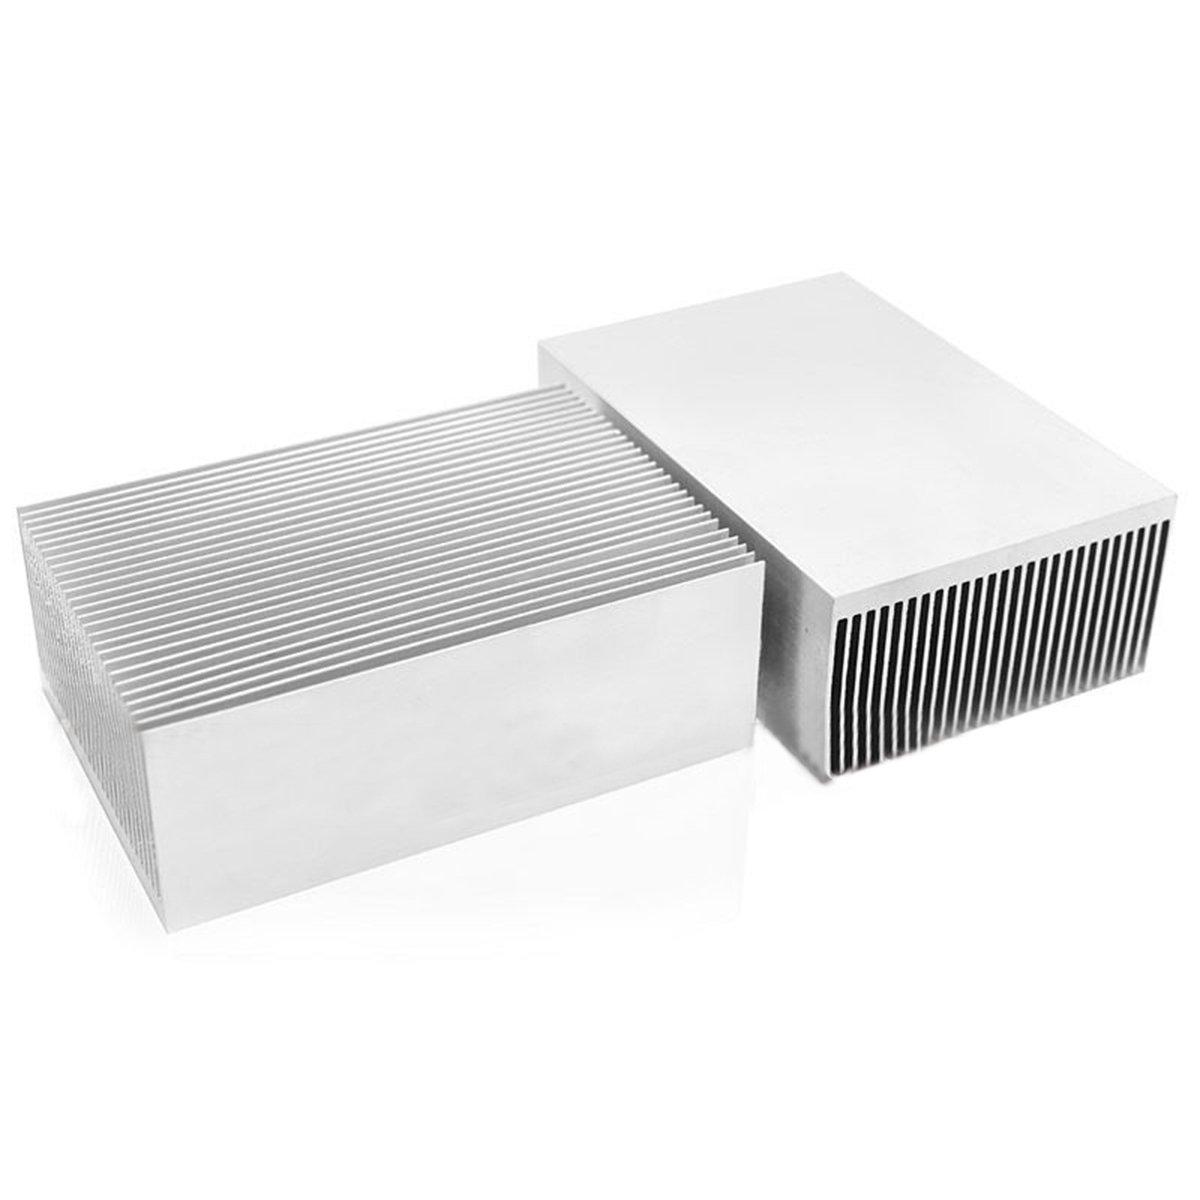 1pc Large Big Aluminum Heatsink Heat Sink Cooling Radiator for Led High Power rf Amplifier Transistor